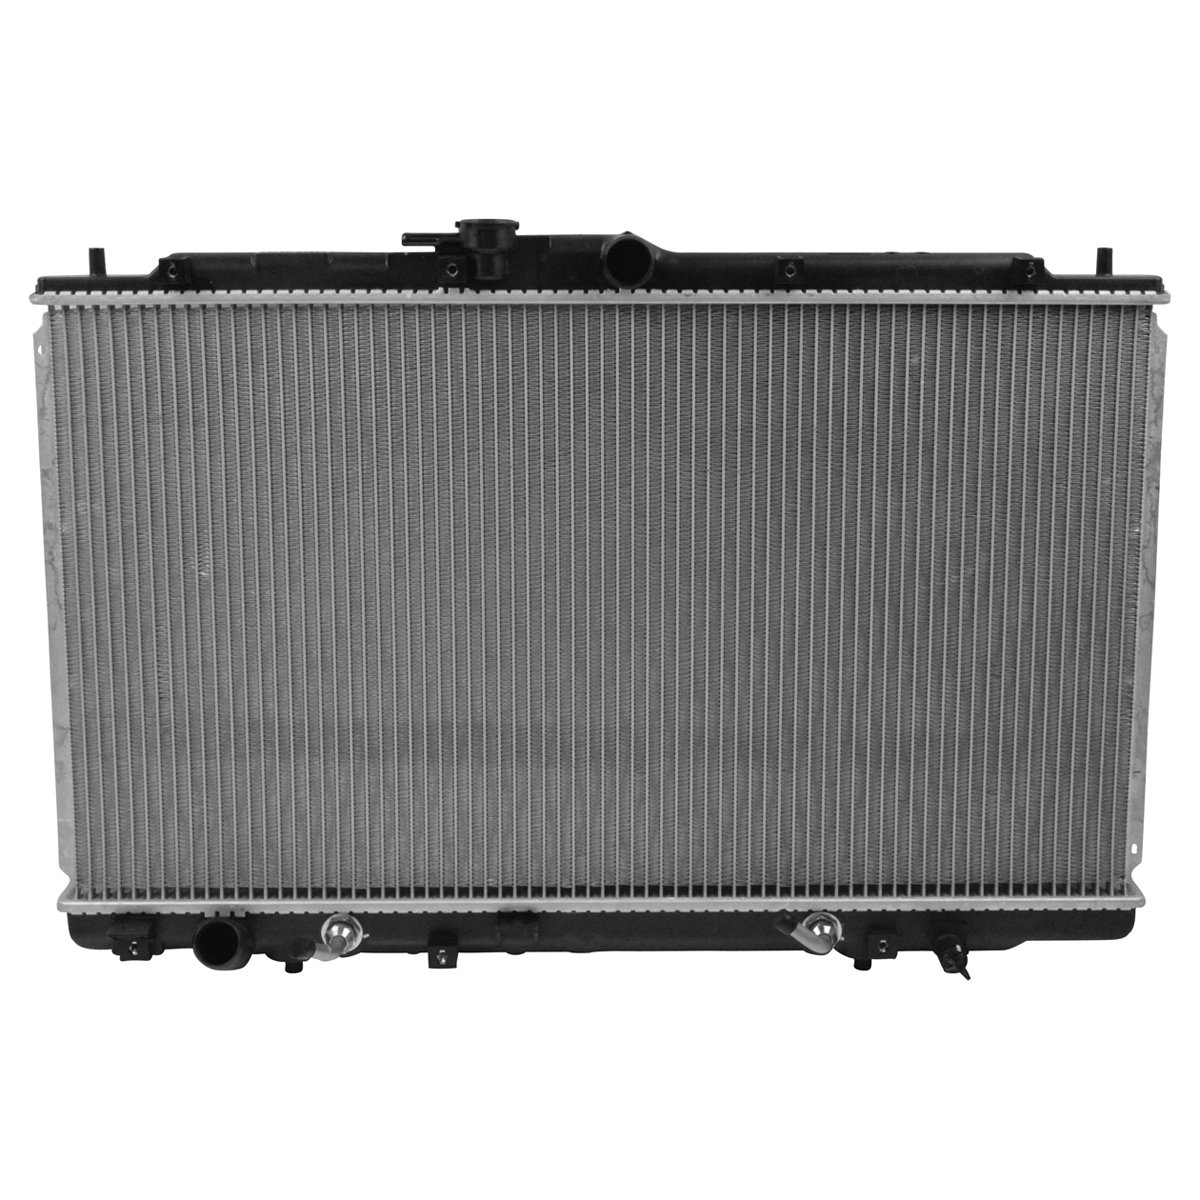 Amazon.com: Radiator Assembly Aluminum Core Plastic Tank for 3.0 Honda  Accord 3.2 Acura TL: Automotive